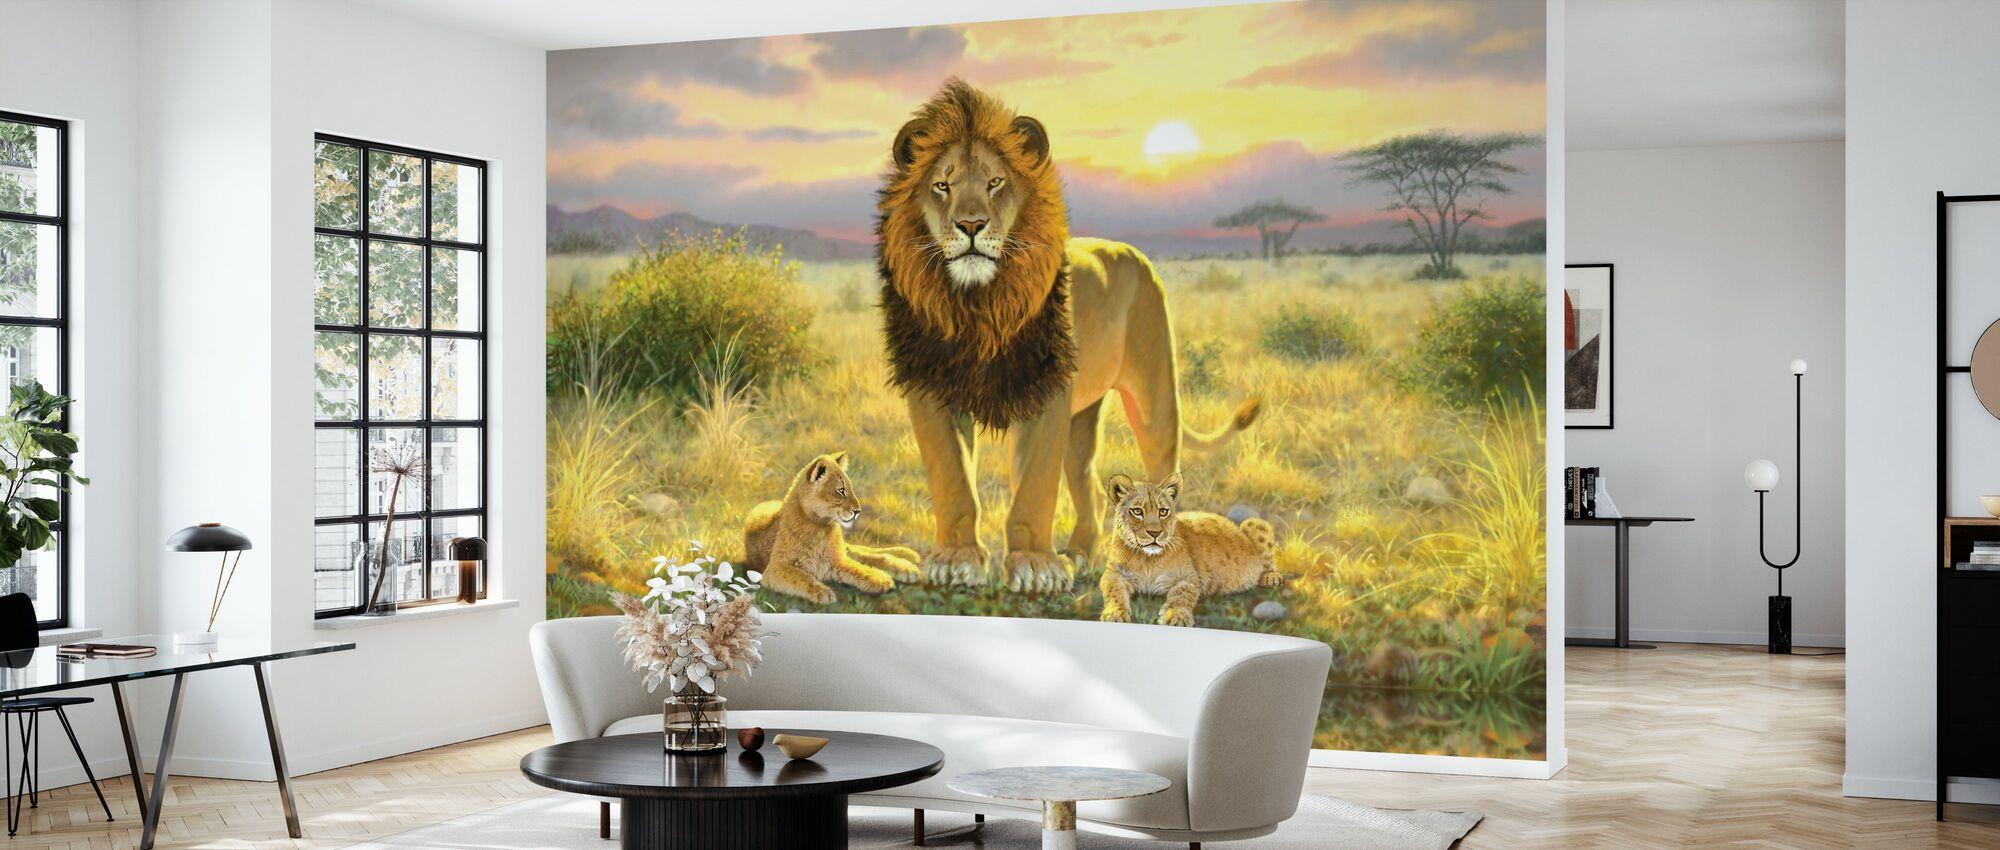 Lion and Twins Landscape - Wallpaper - Living Room